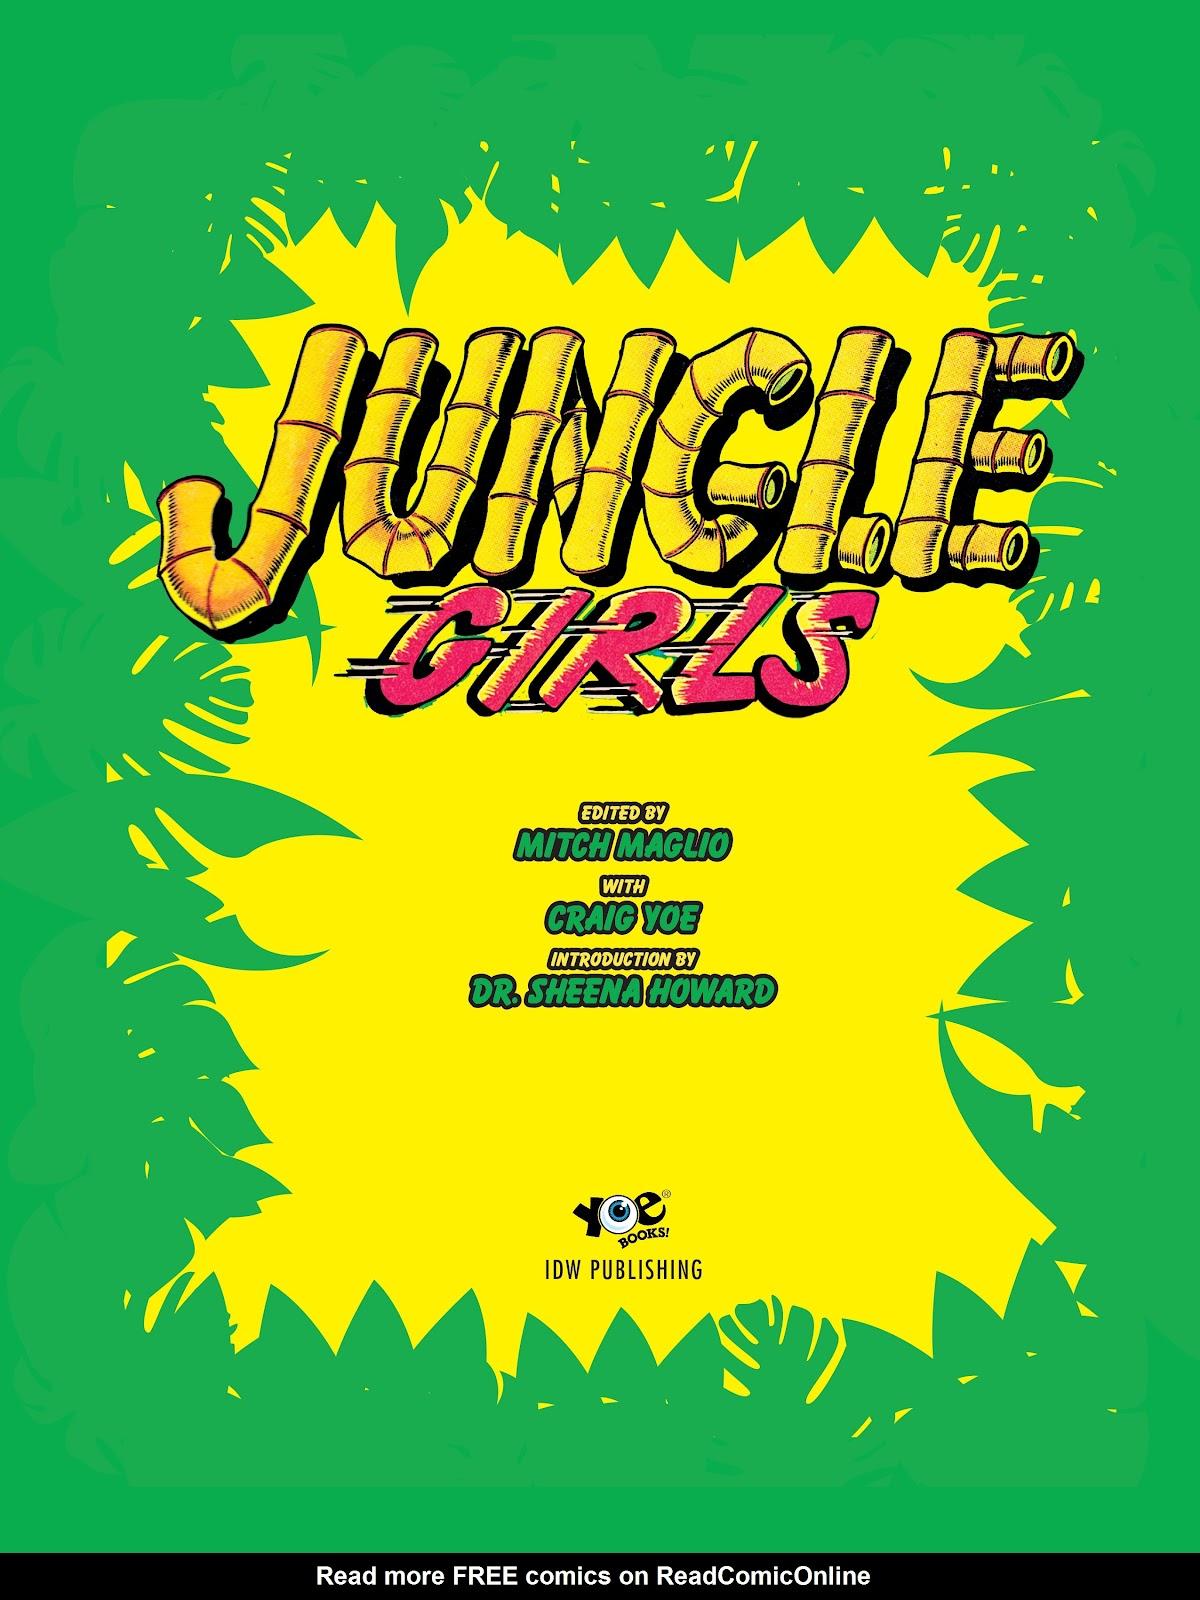 Read online Jungle Girls comic -  Issue # TPB (Part 1) - 3